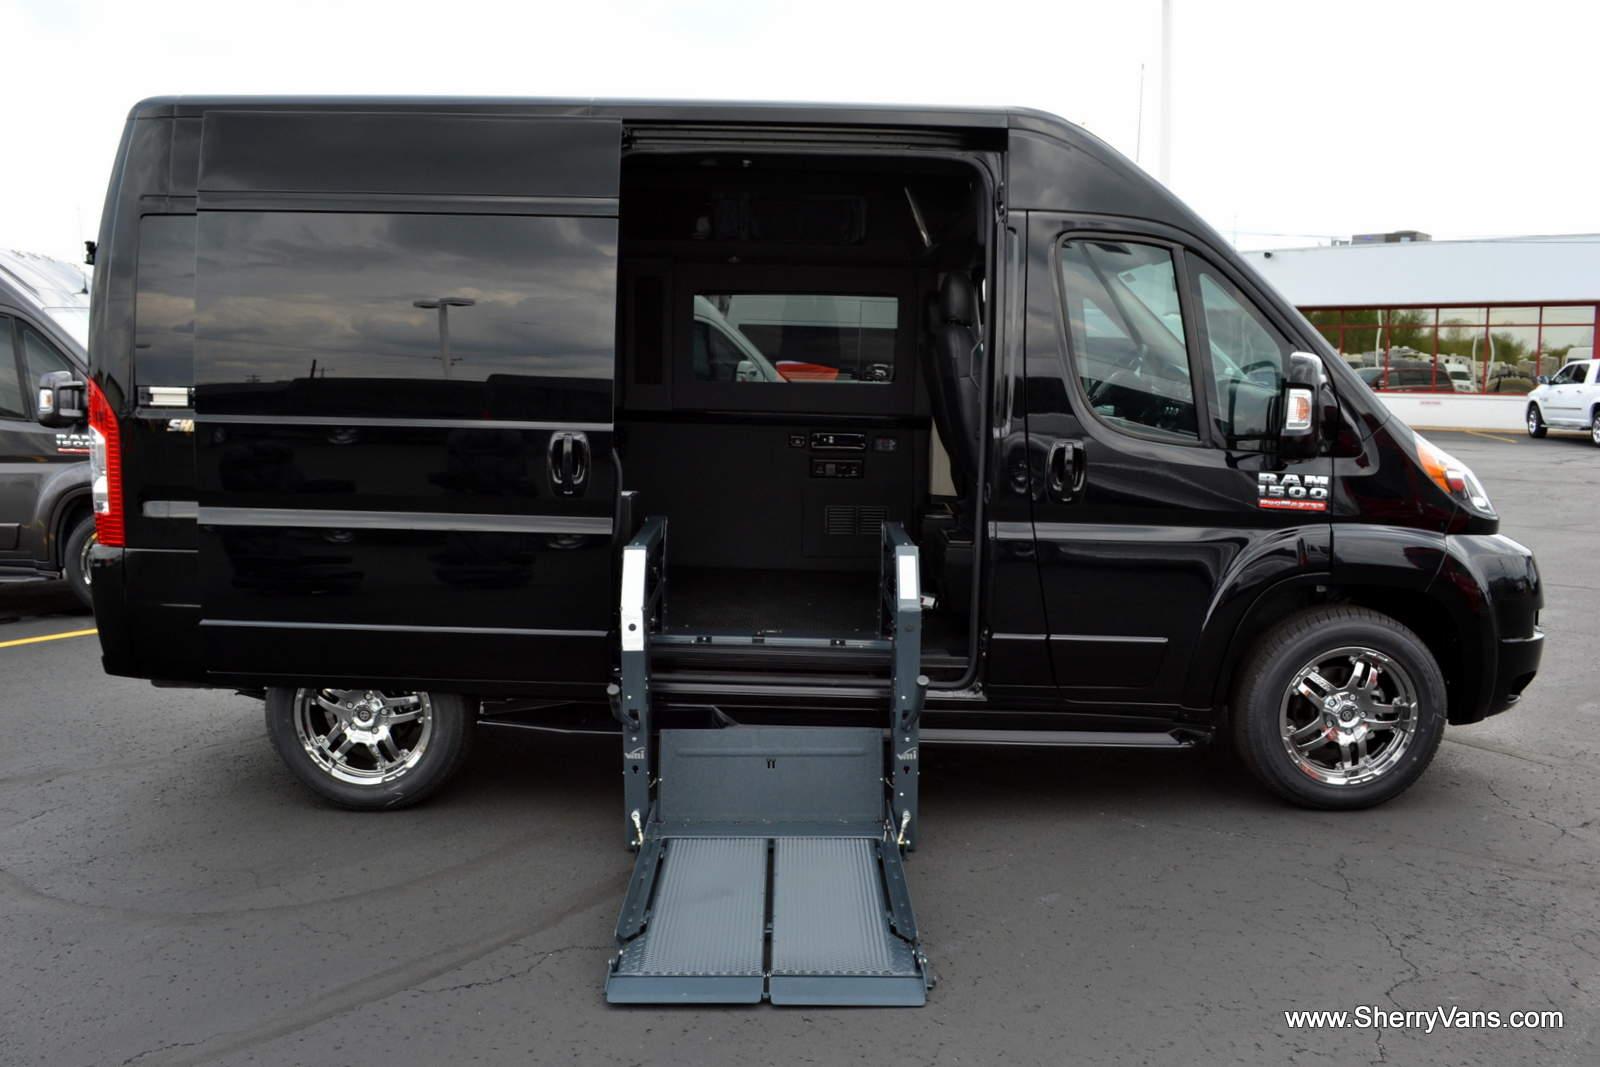 2016 RAM SHERRY VANS HIGHTOP Mobility CONVERSION VAN